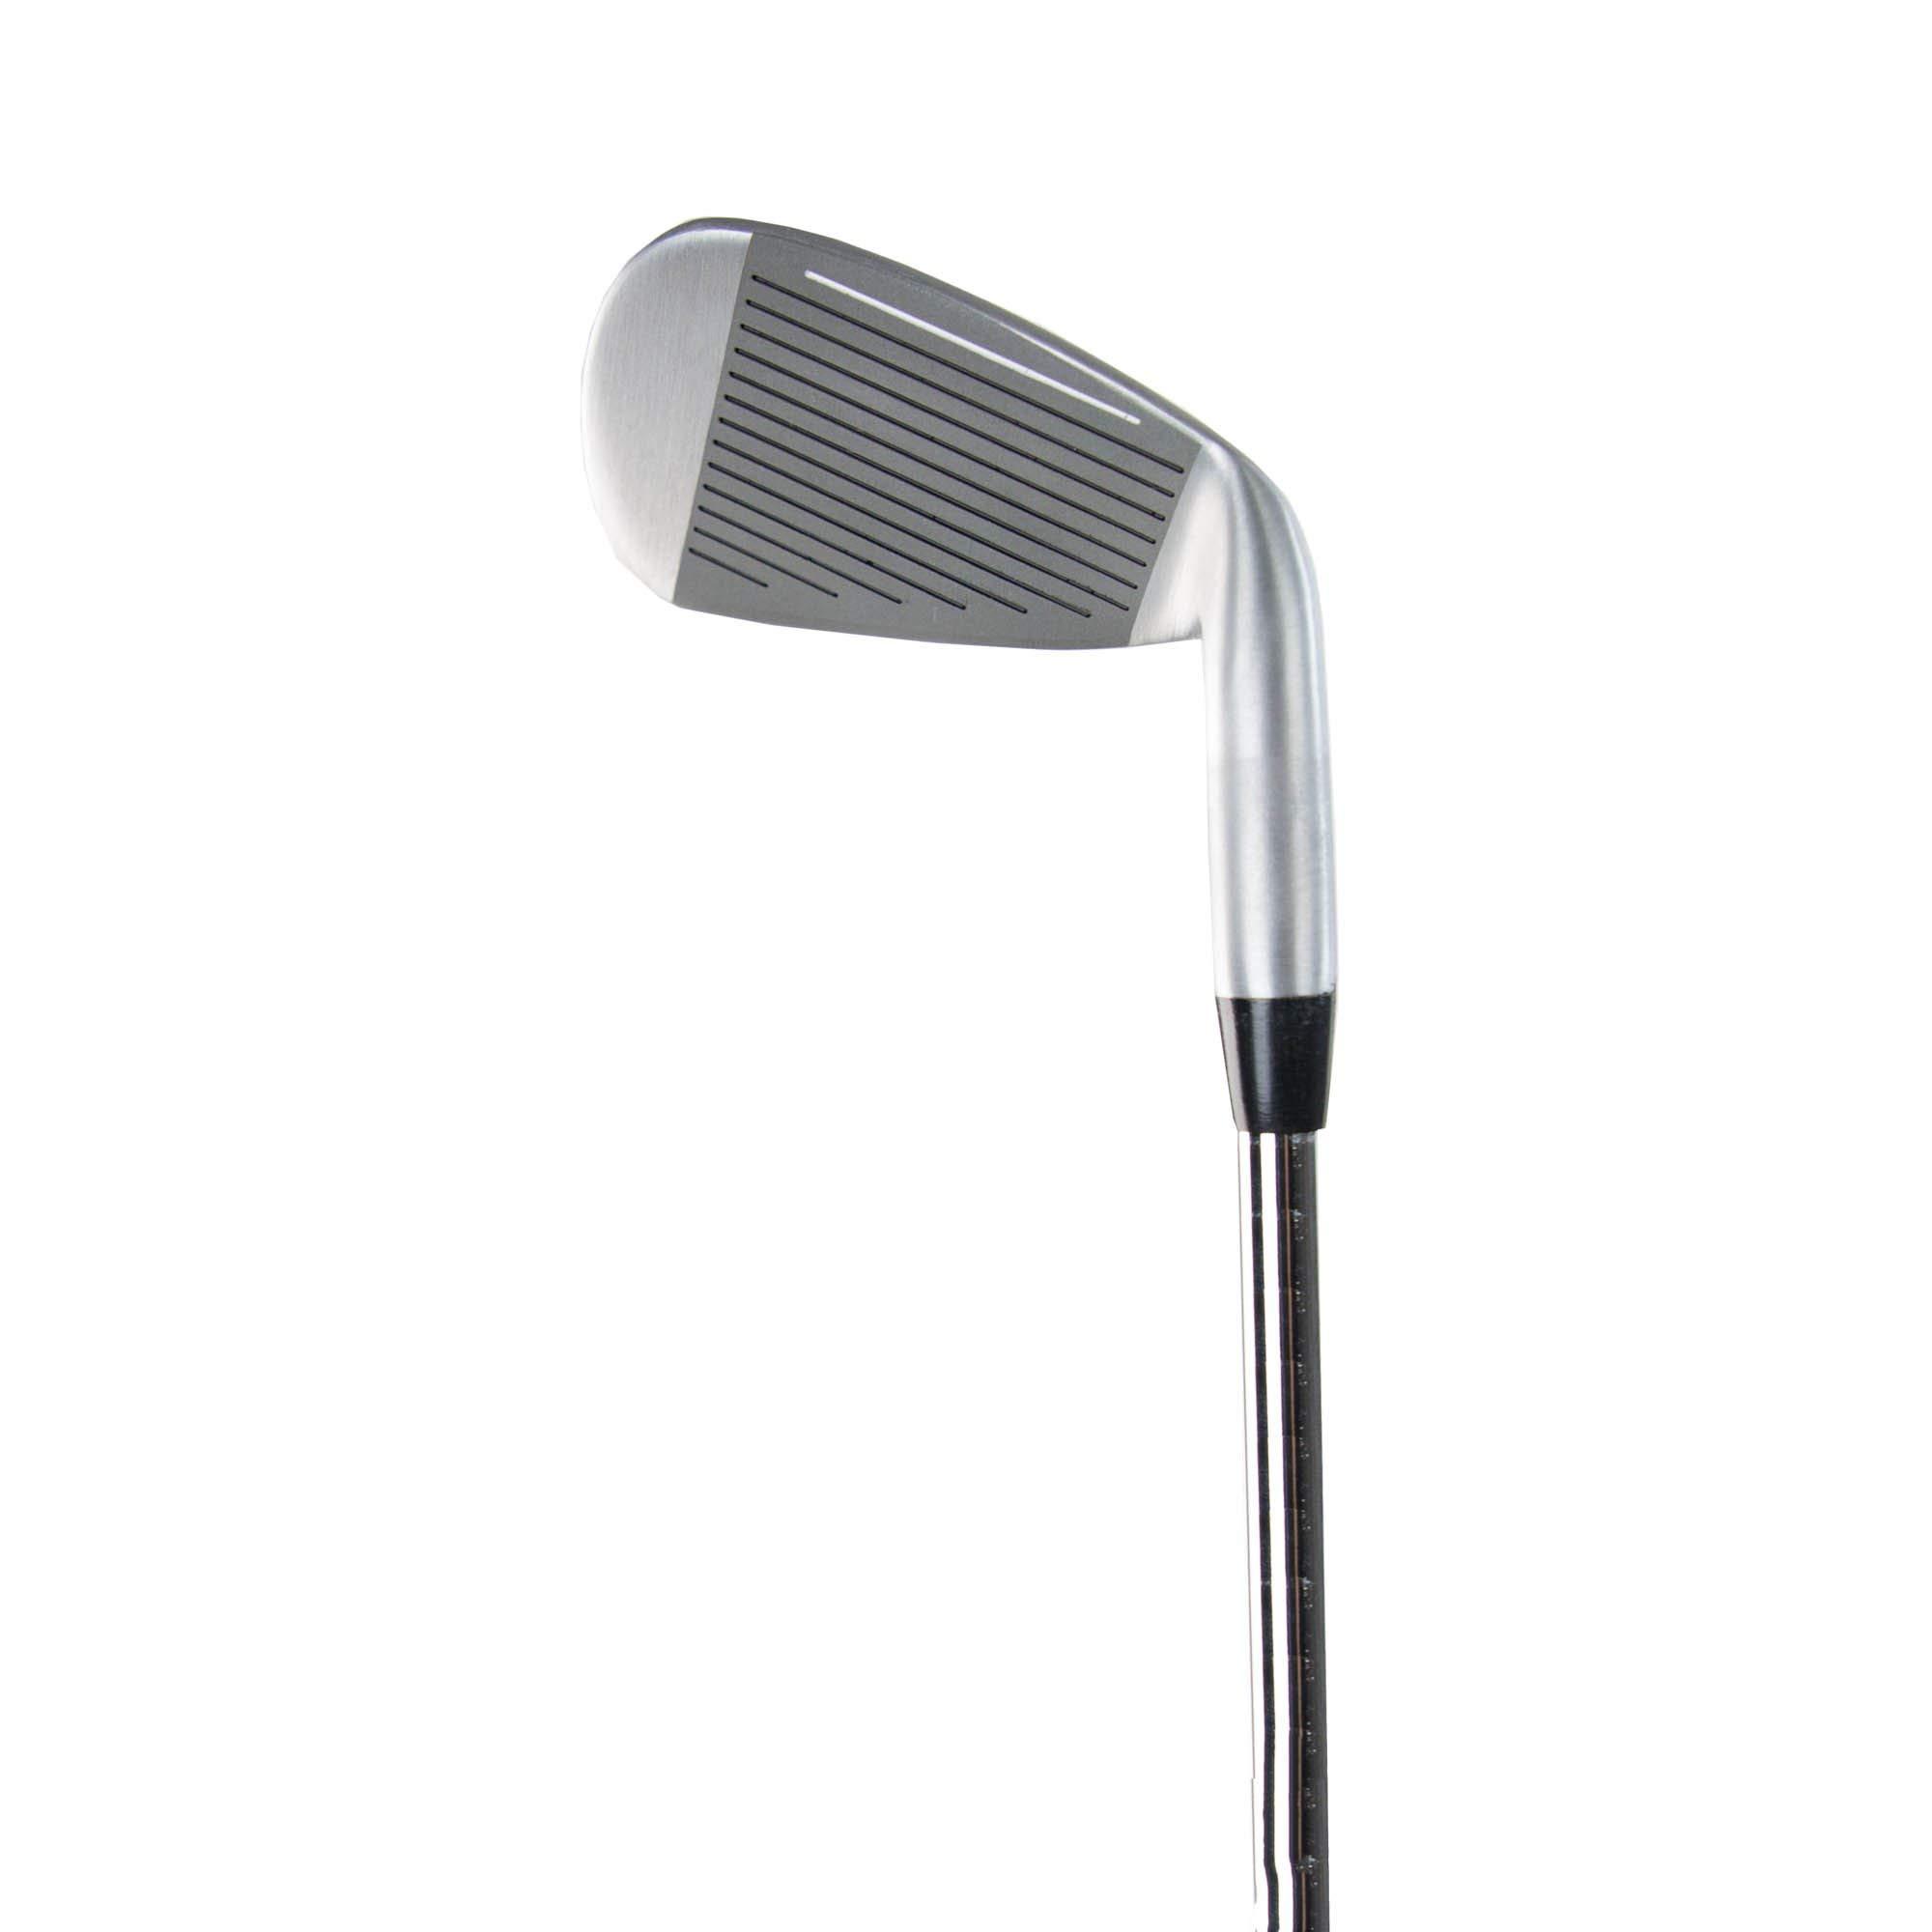 Womens Left Handed Golf Clubs >> Wilson Ultra Womens Left Handed Complete Golf Club Set With Cart Bag